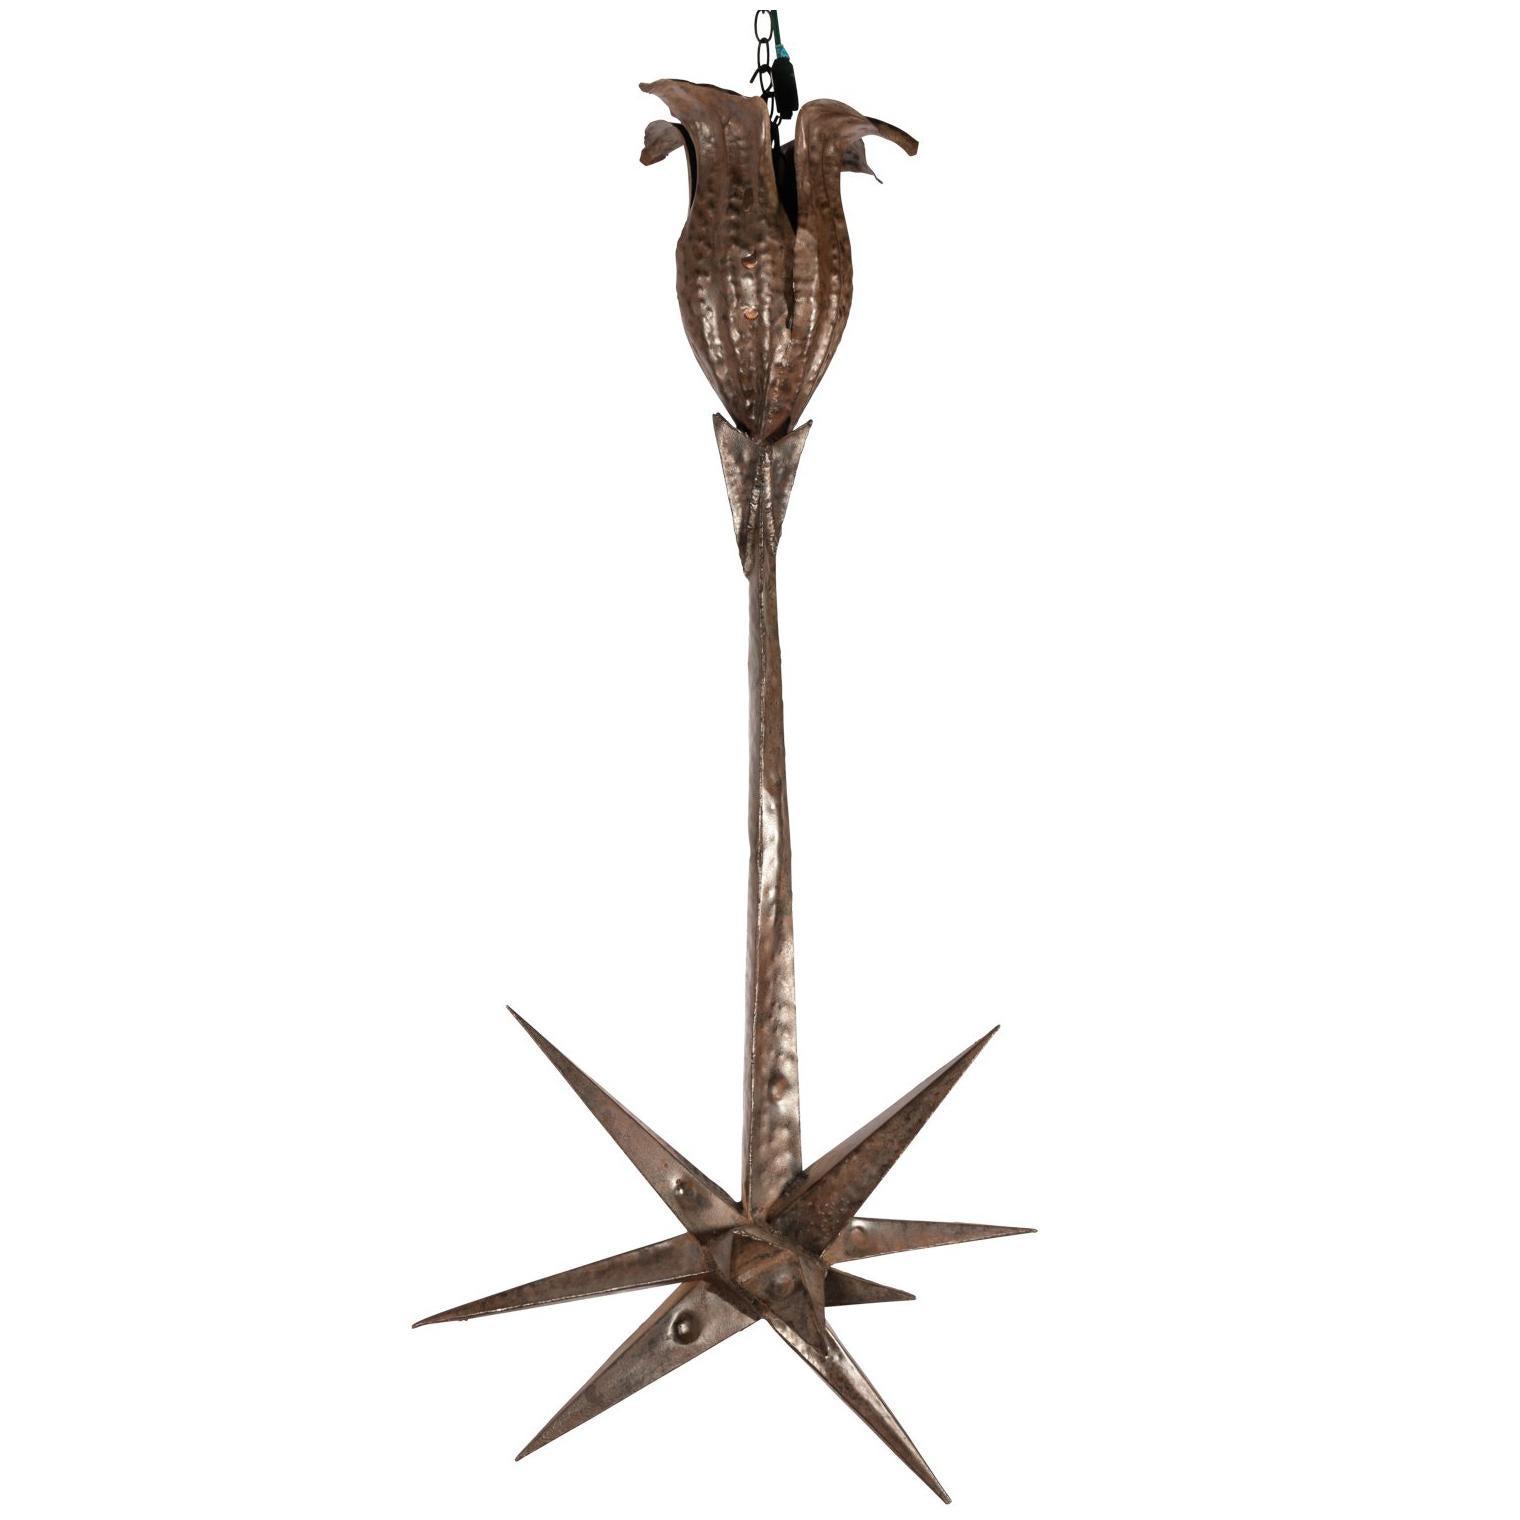 Brutalist Hanging Sculpture